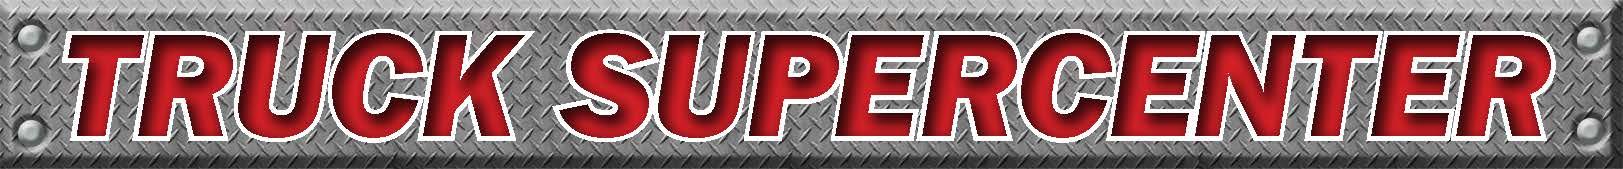 Reedman Toll Service Hours >> New & Used Car Dealers Philadelphia PA | Dodge Chrysler Jeep Chevy Dealers Philadelphia PA ...